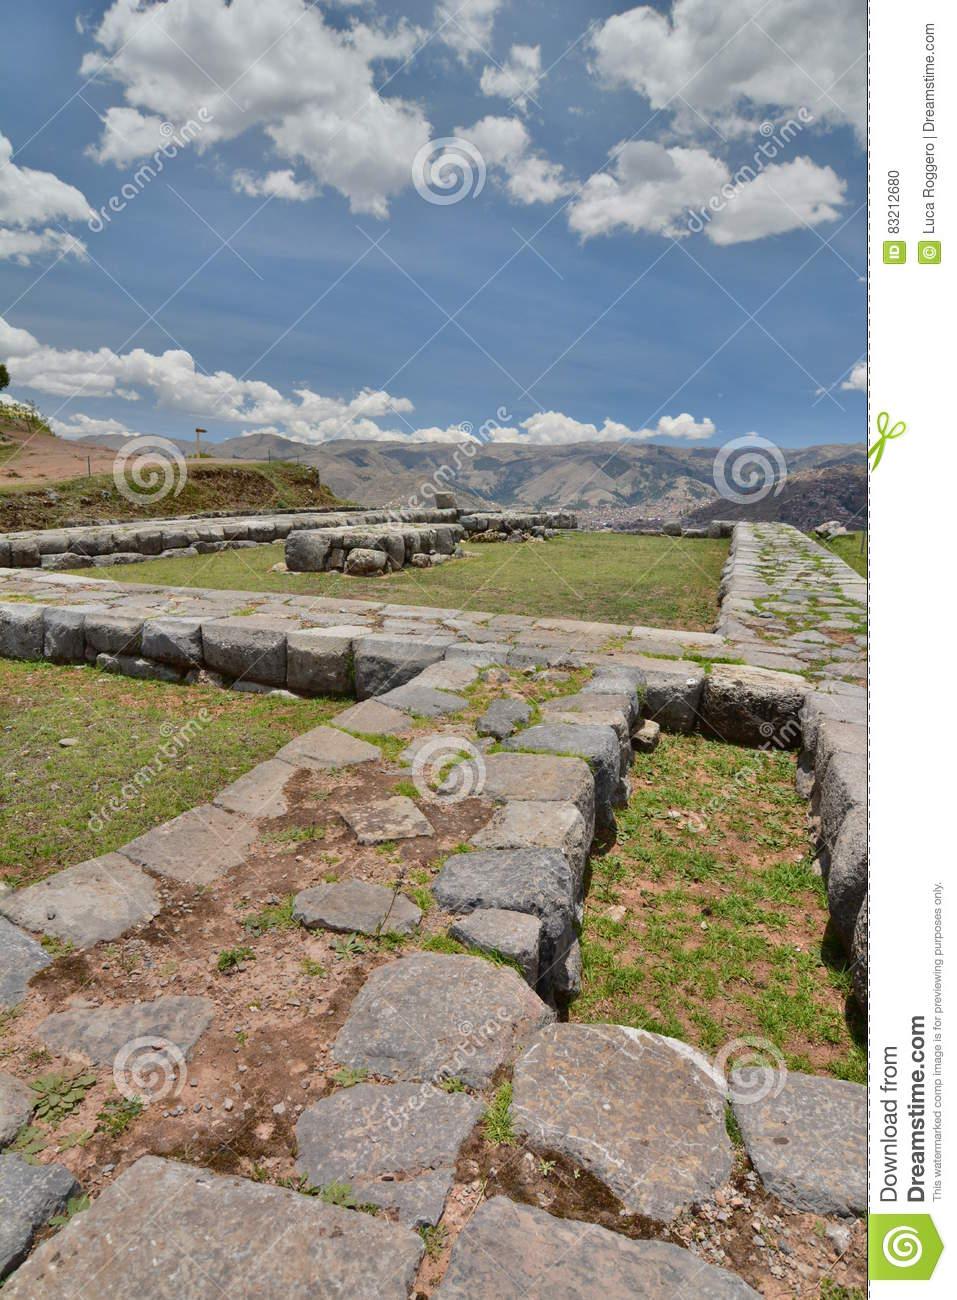 Saqsaywaman Archaeological Inca Site. Cusco. Peru Stock Photo.